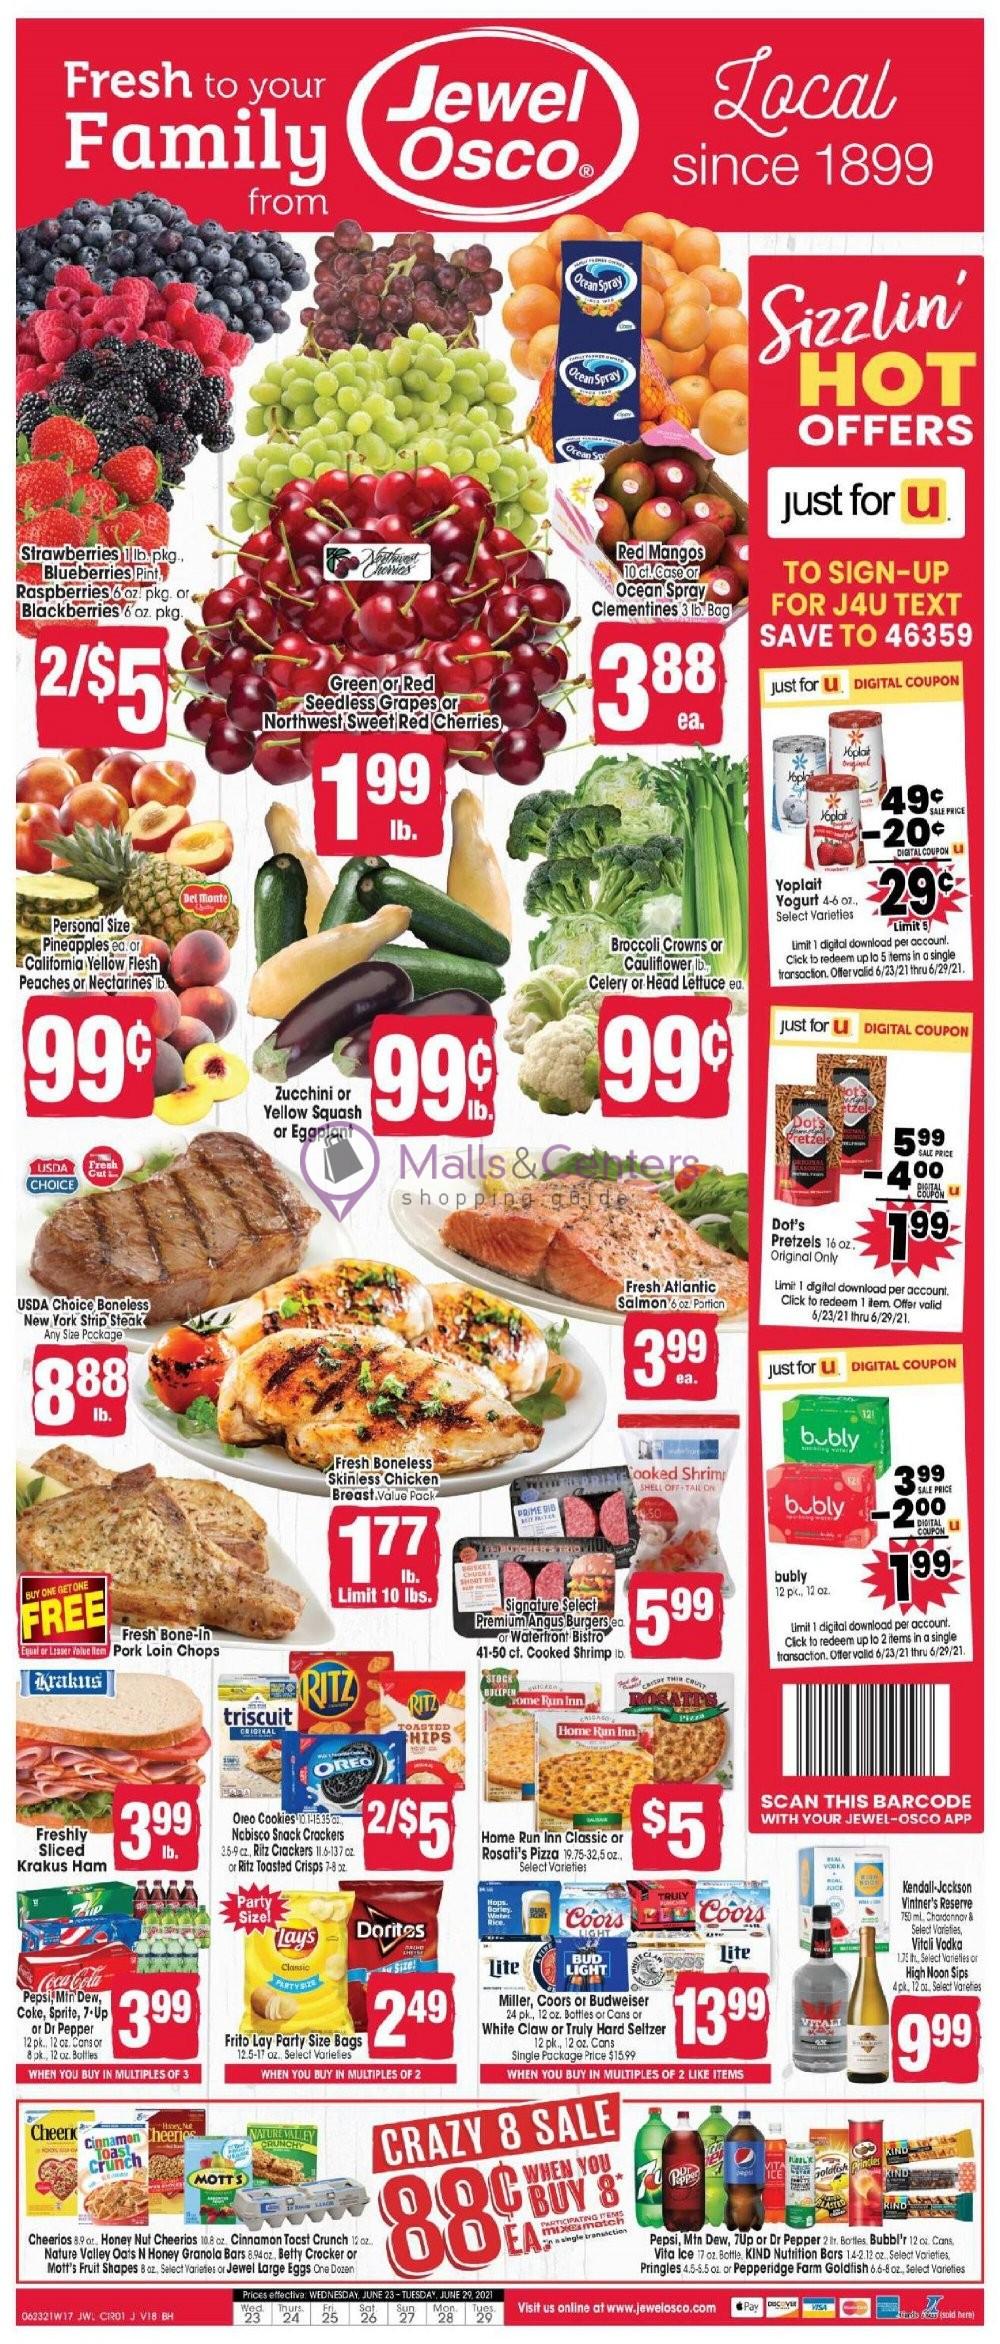 weekly ads Jewel-Osco - page 1 - mallscenters.com